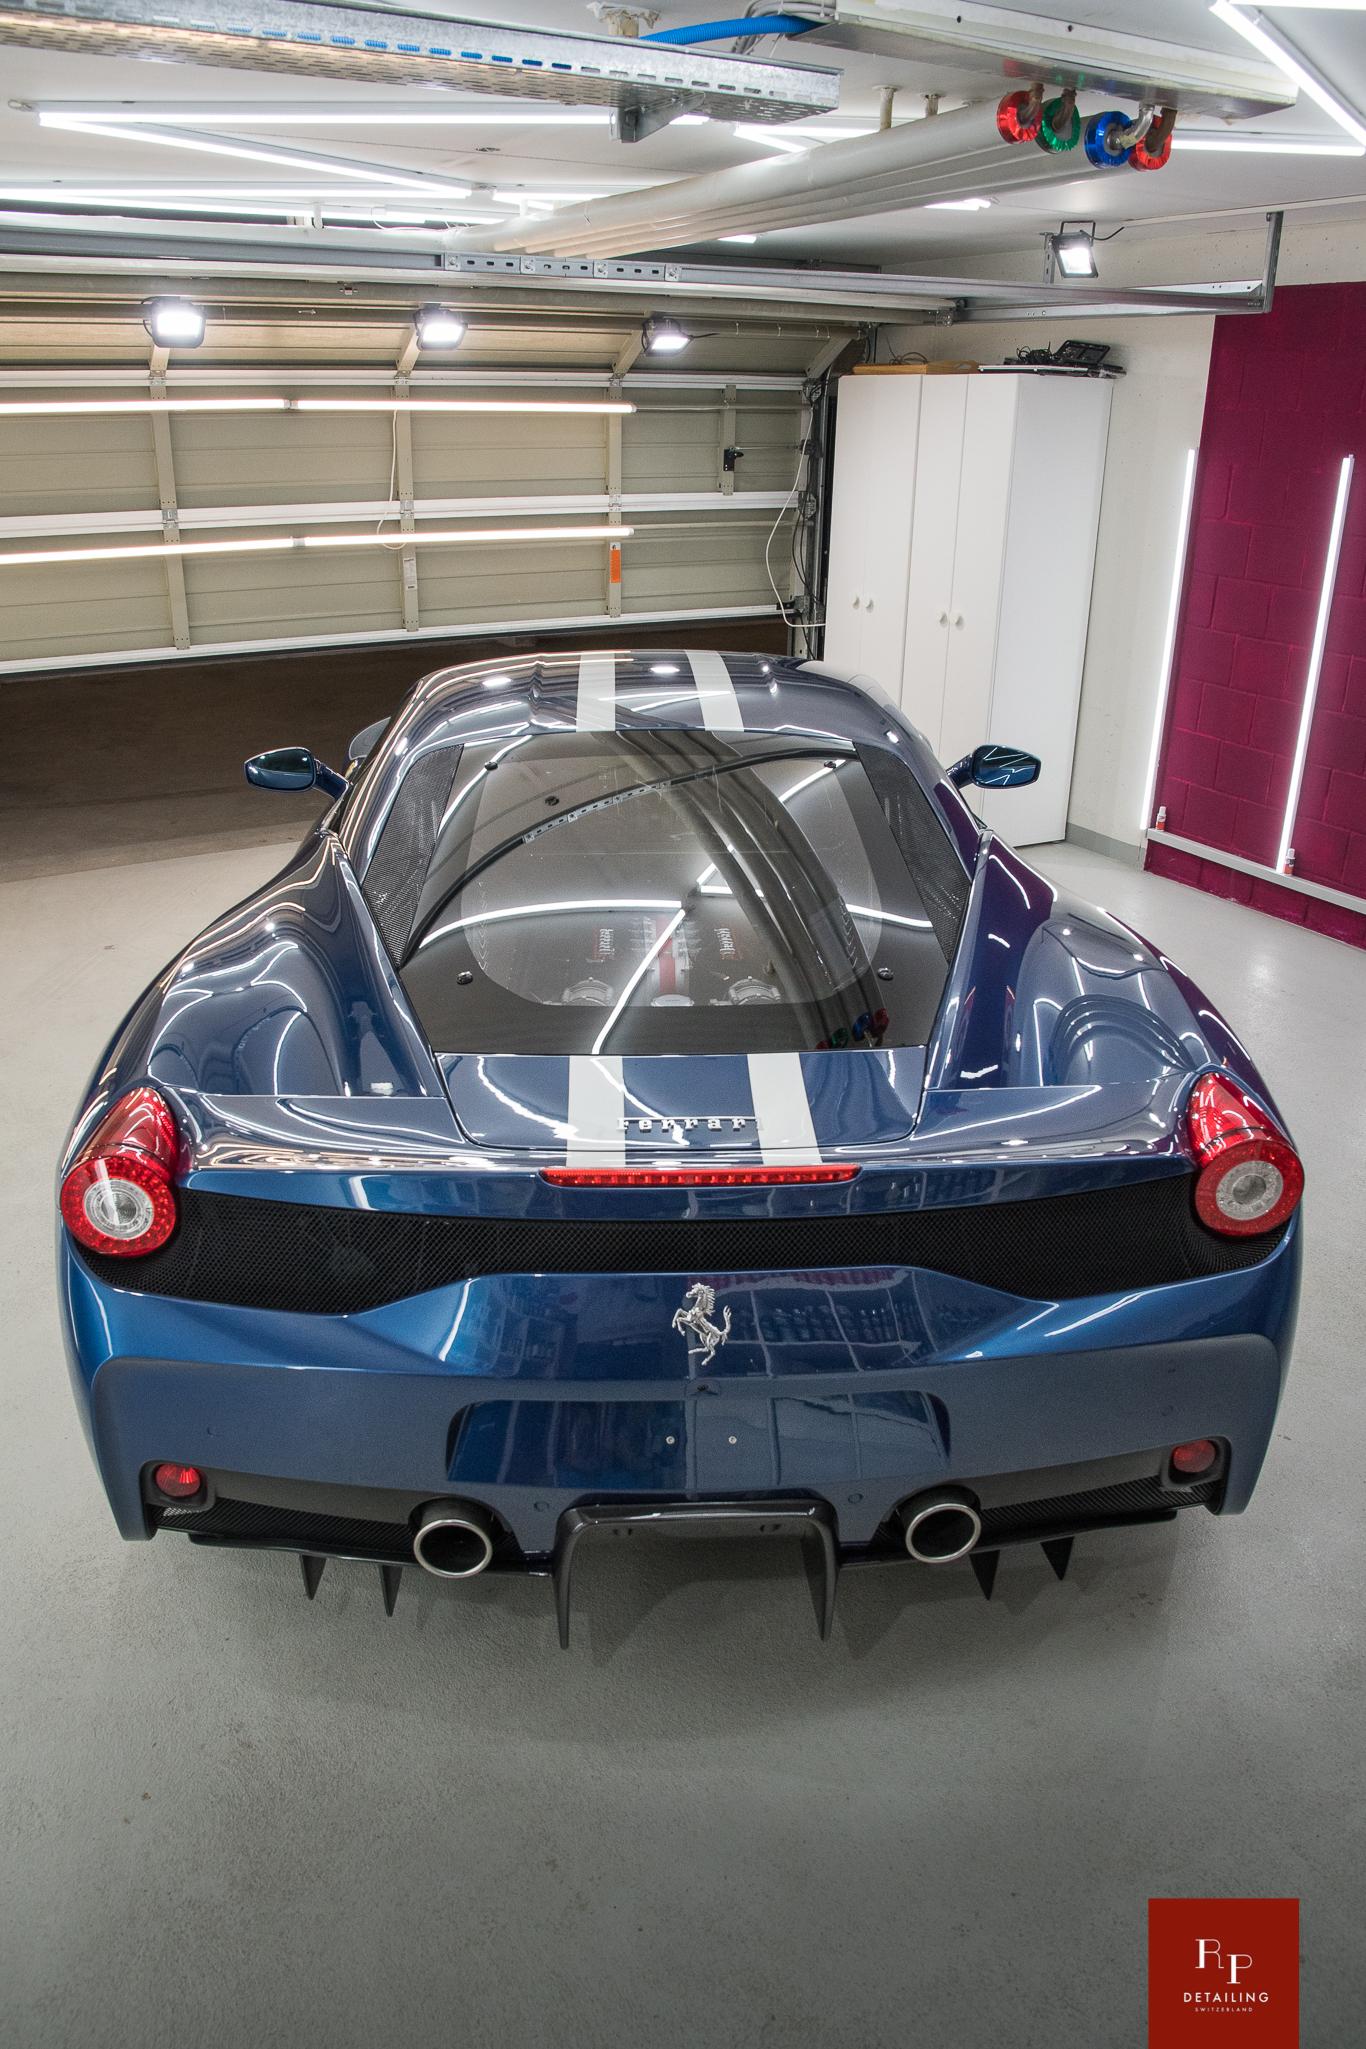 Ferrari%20Speciale%20RP%2021.jpg